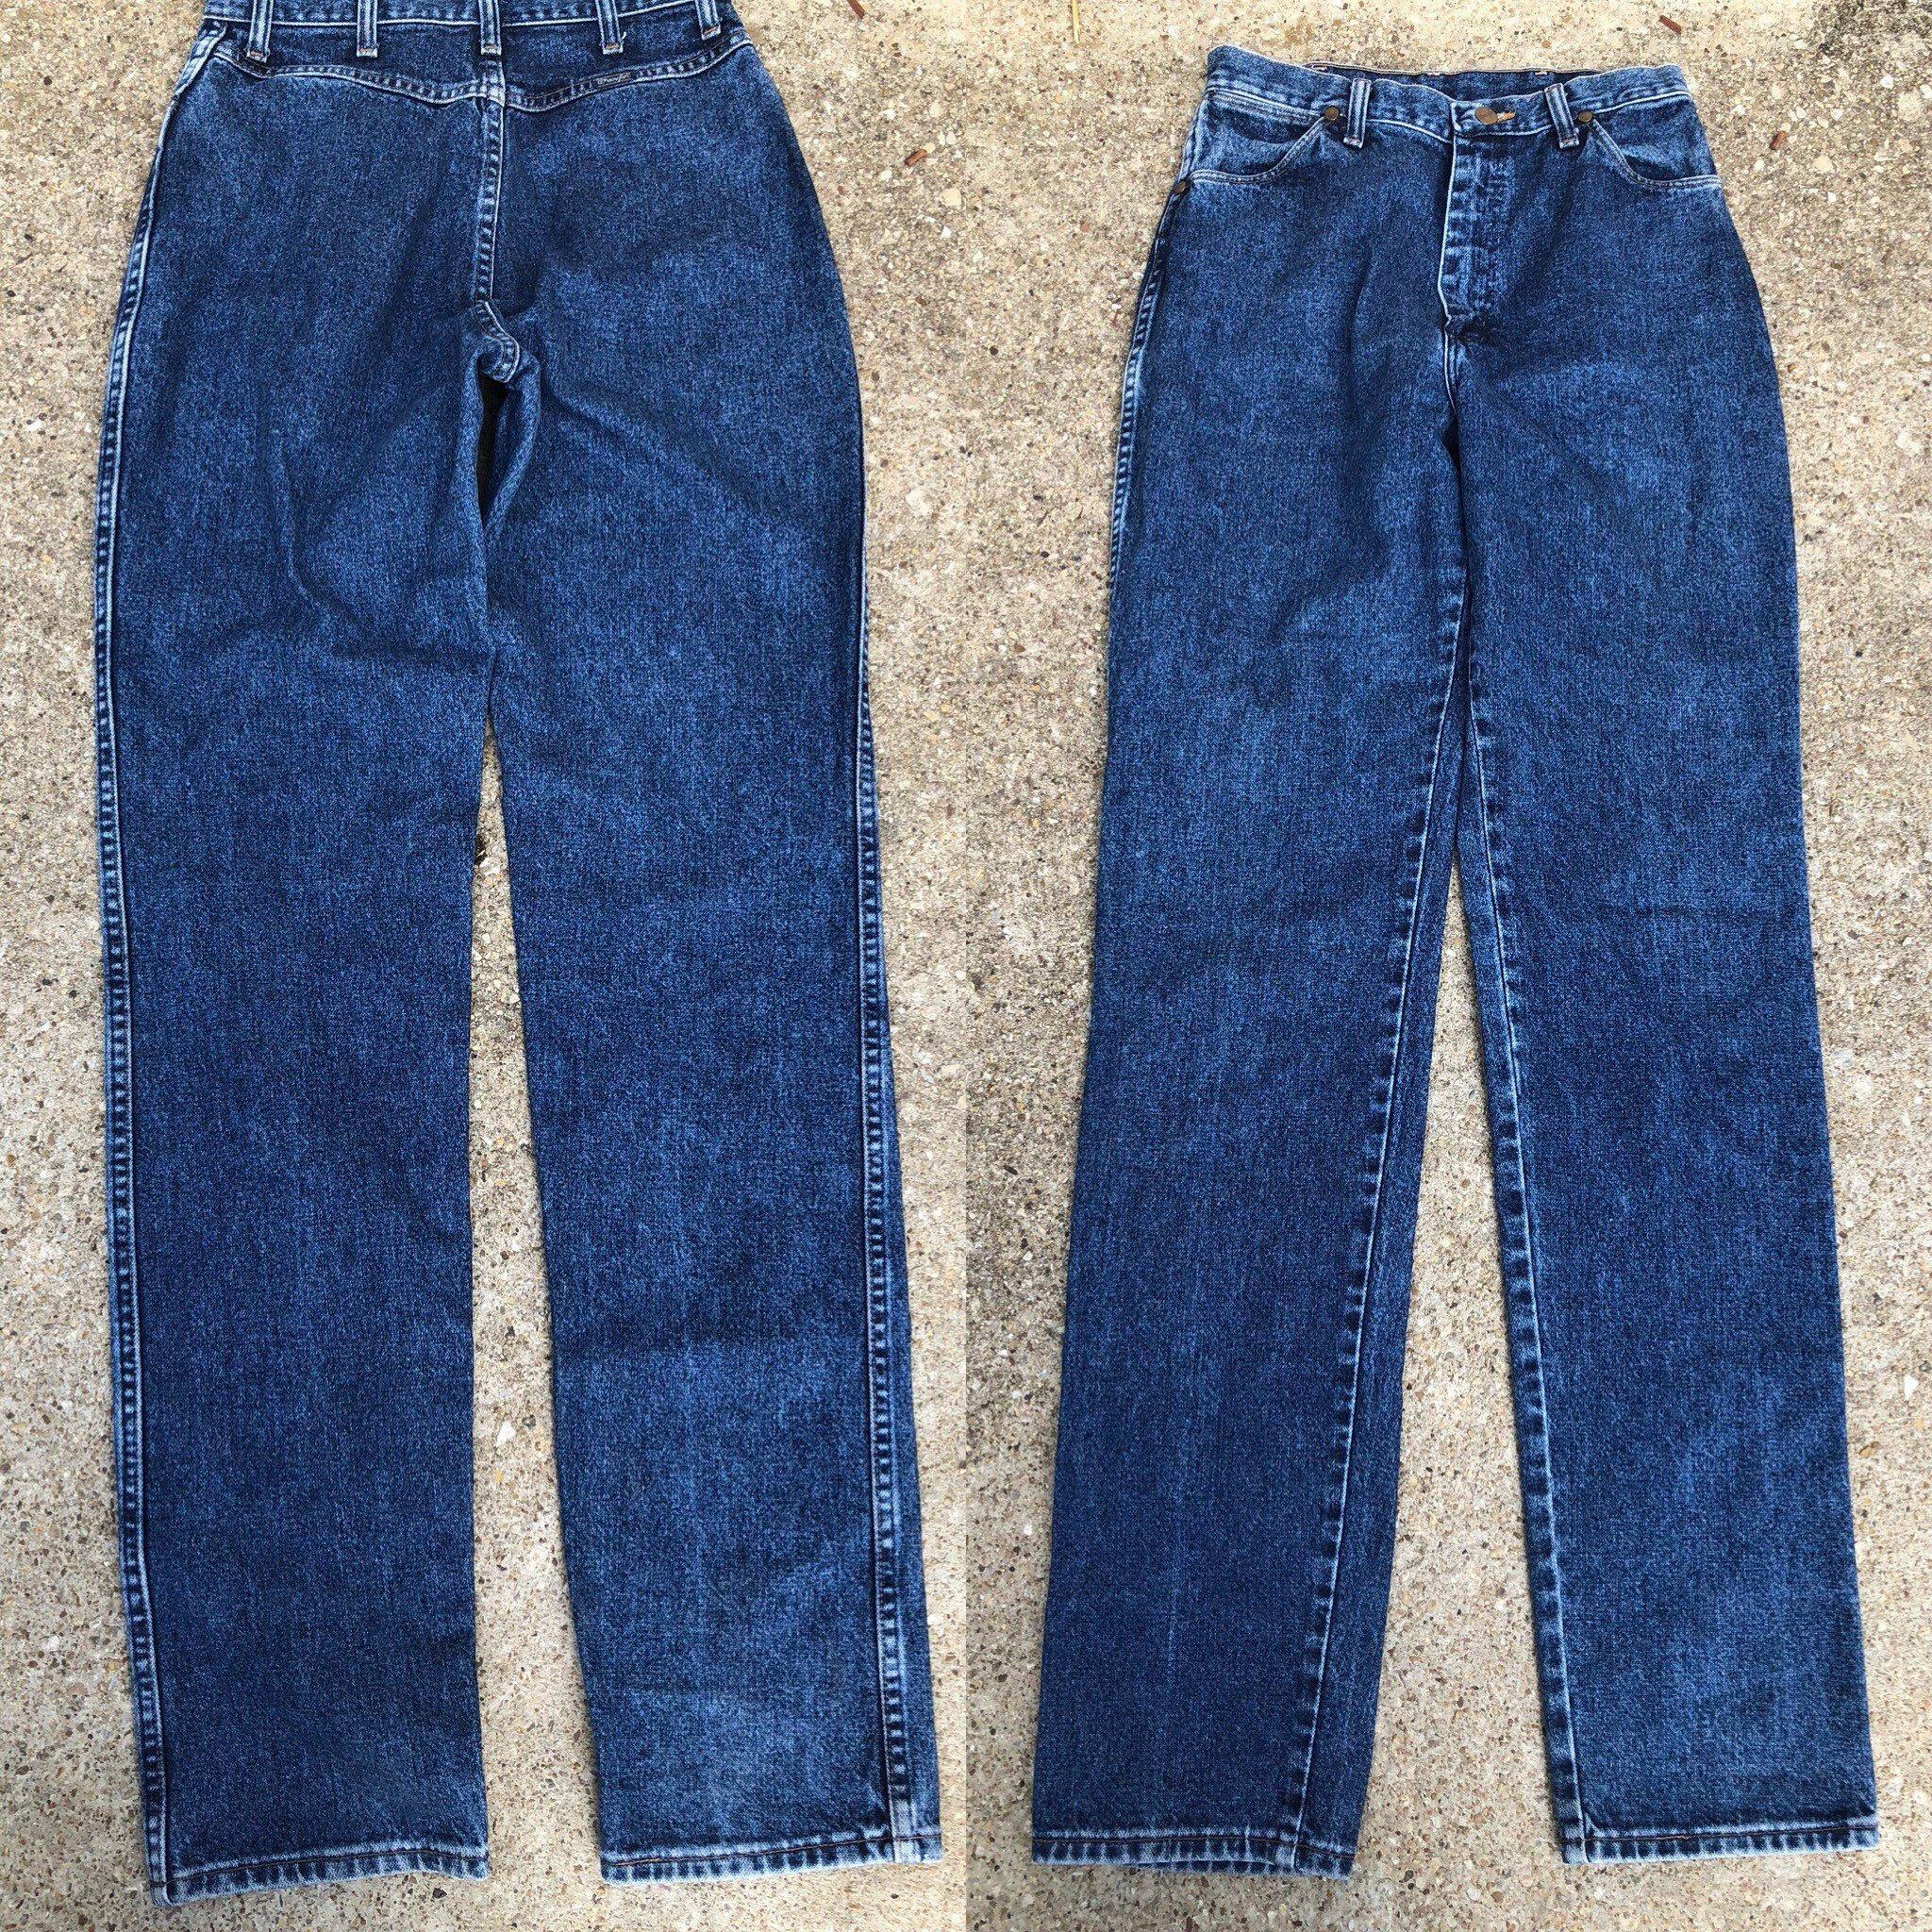 Non Womens Denim Jeans Vintage Skinny Blue Elastic